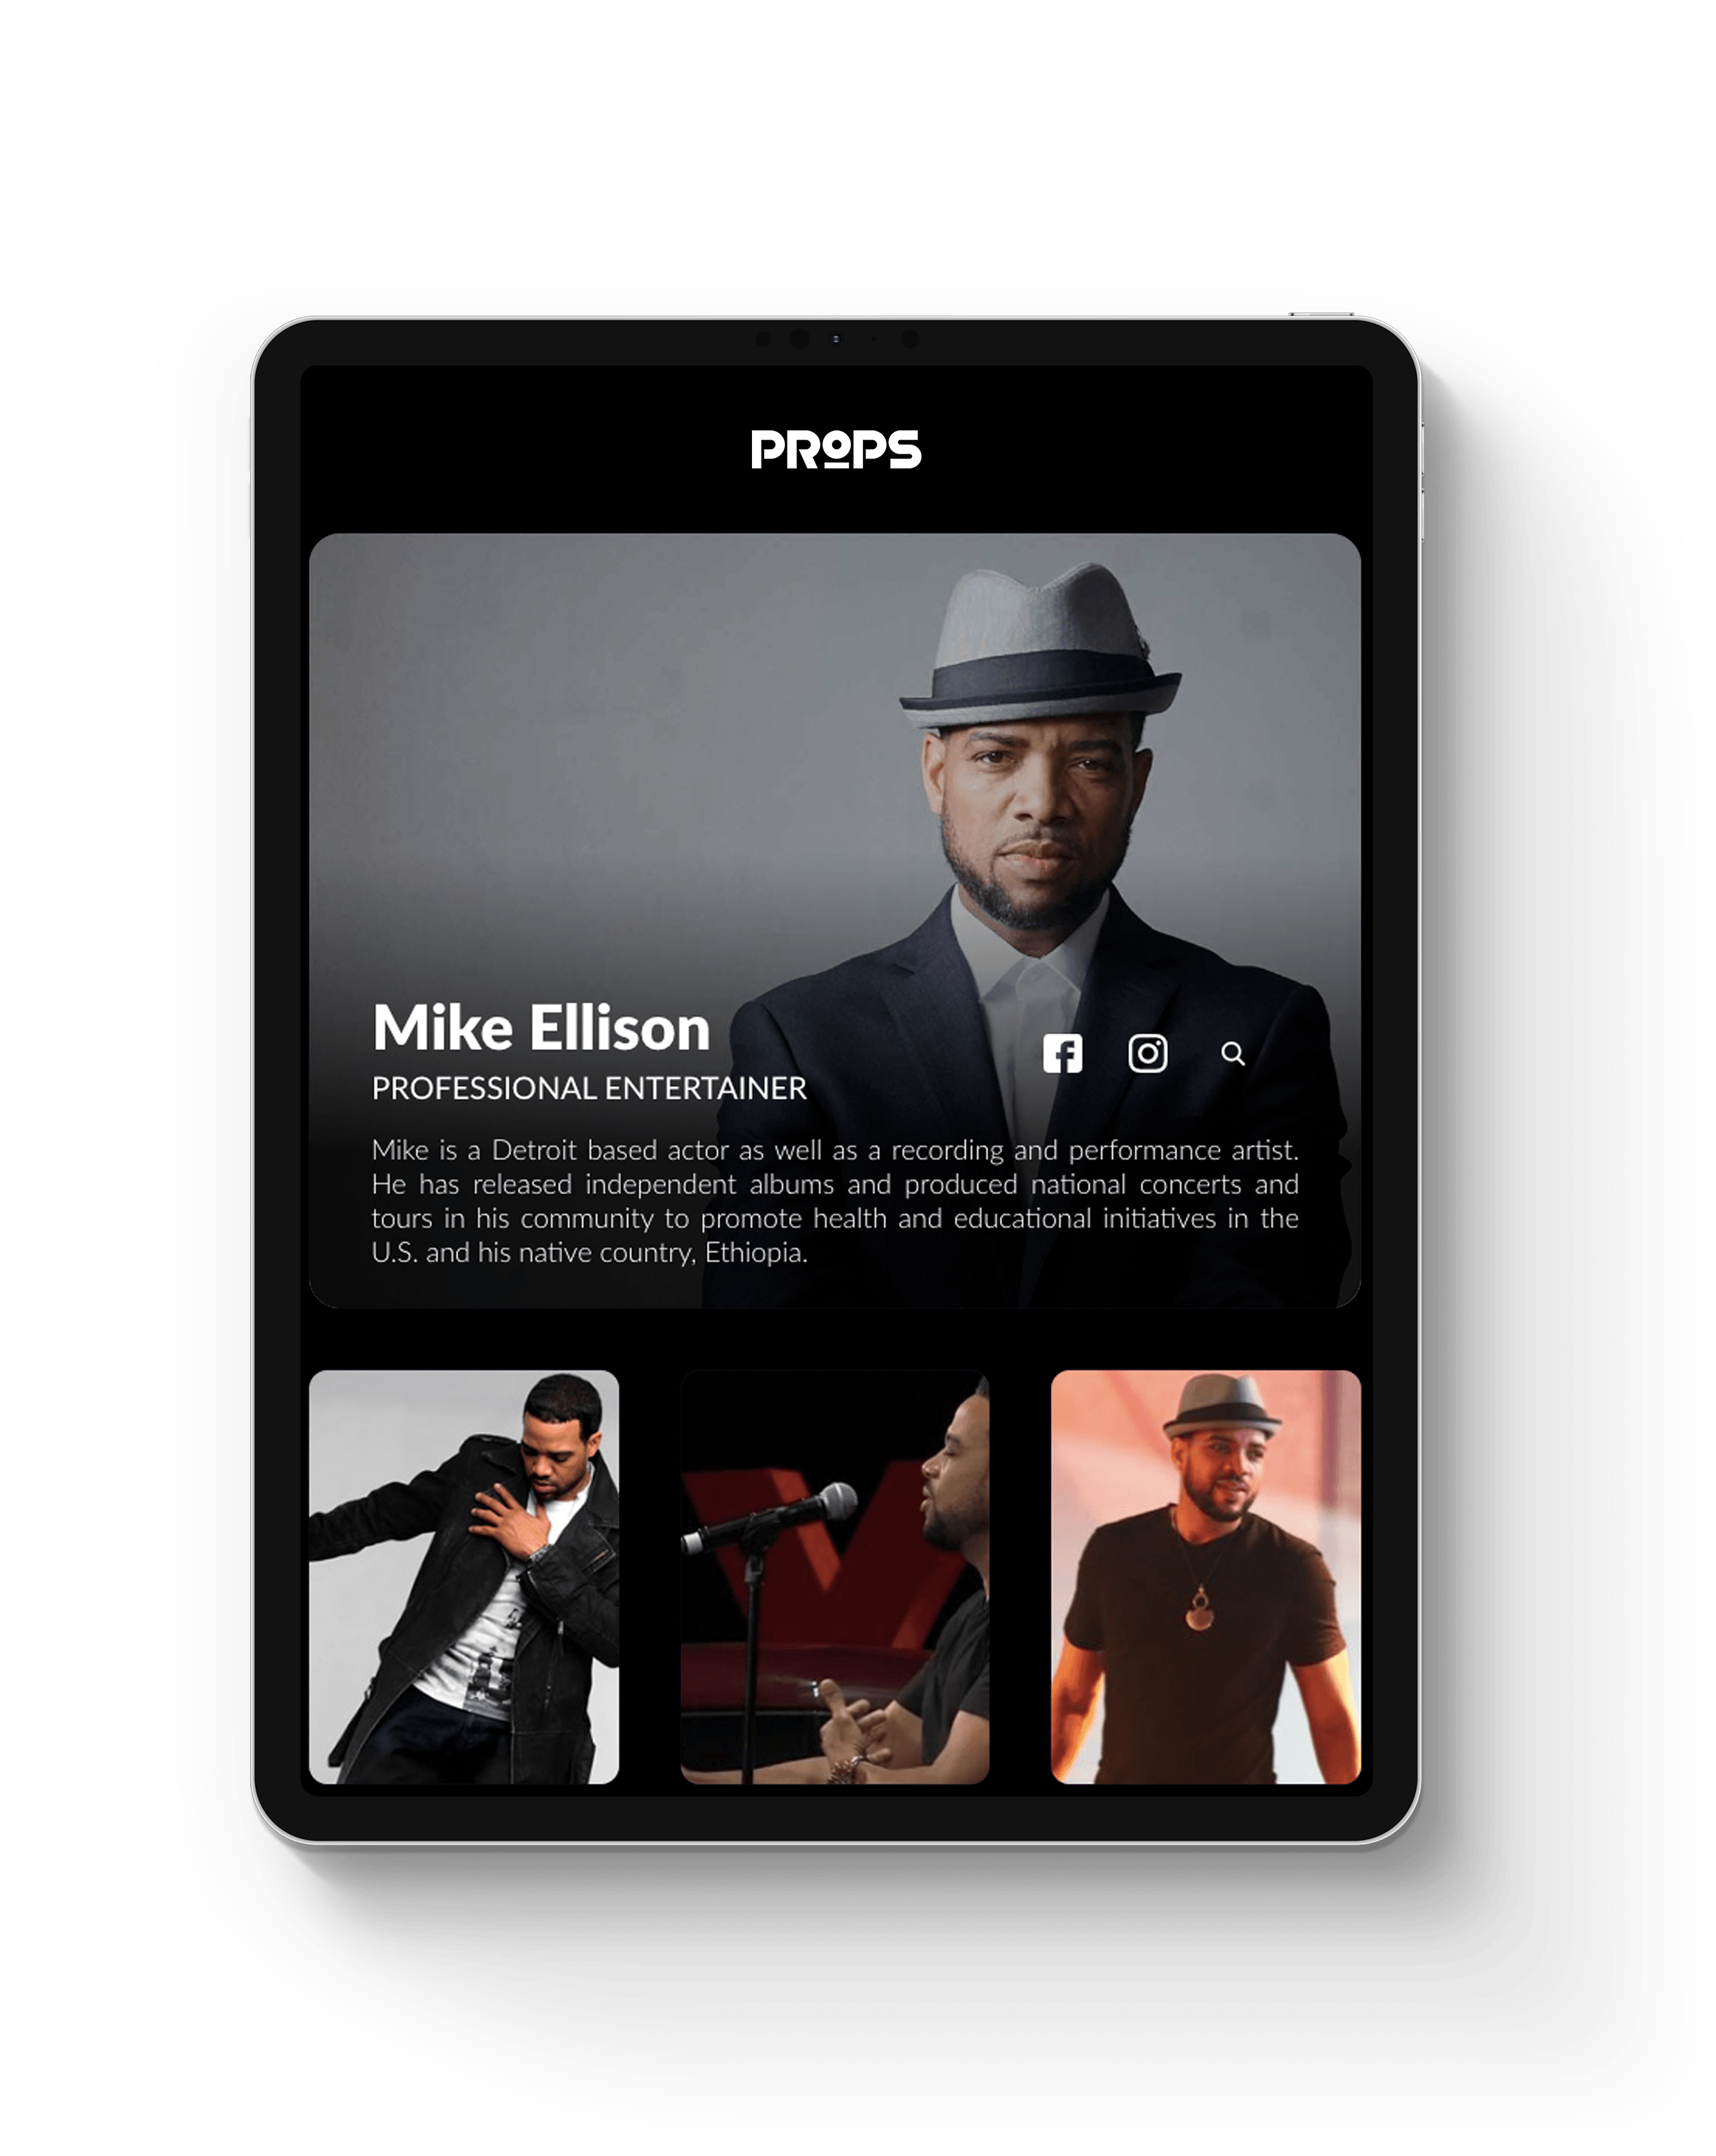 mike Ellison webpage image